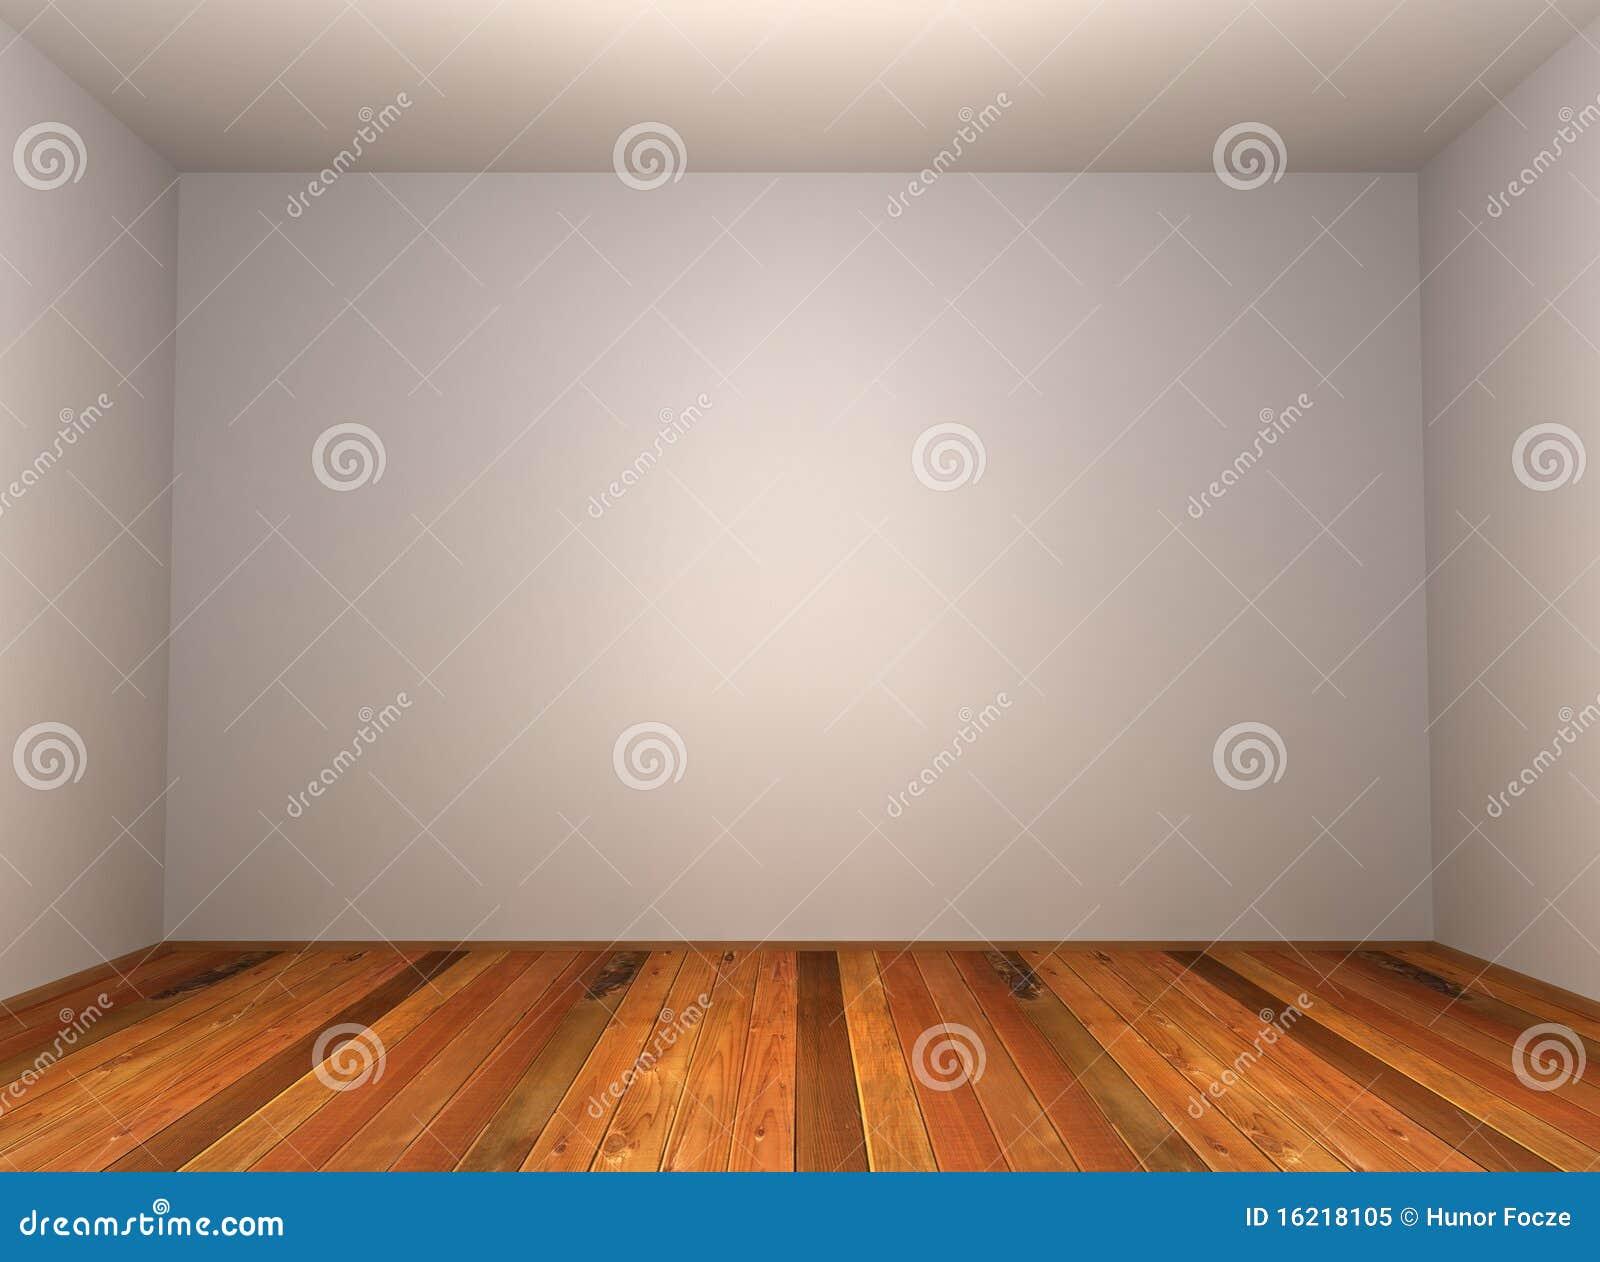 3d empty room with wood parquet stock illustration image 16218105. Black Bedroom Furniture Sets. Home Design Ideas